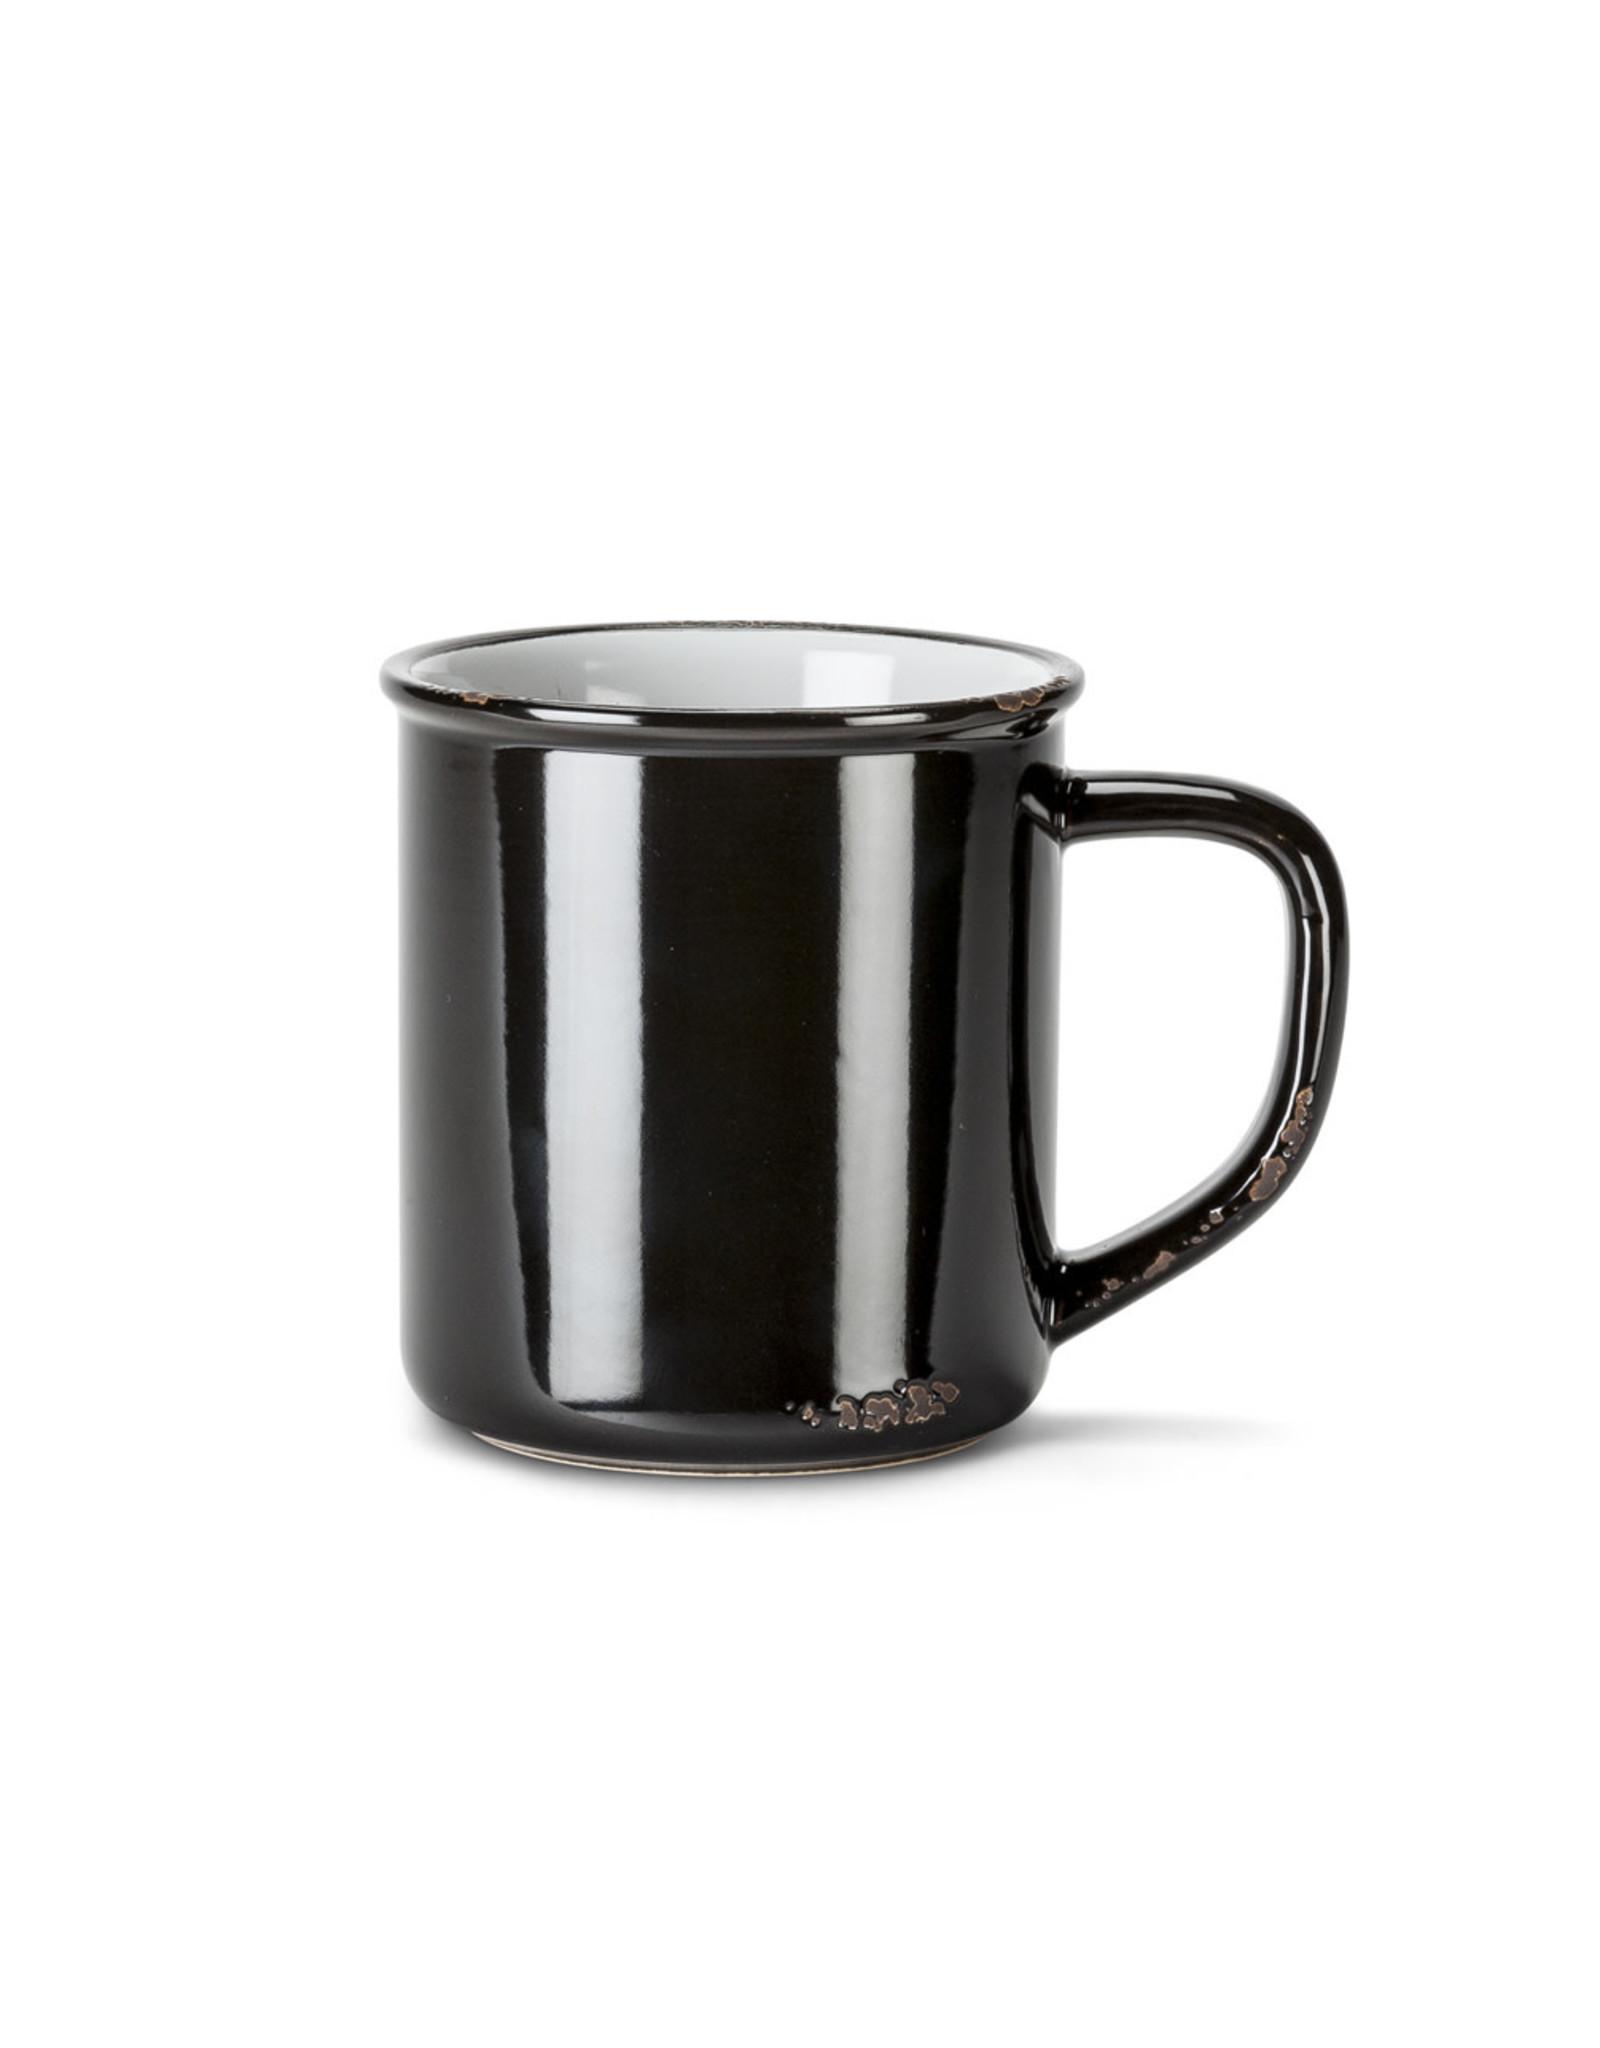 Tasse noire en grès (14 oz)